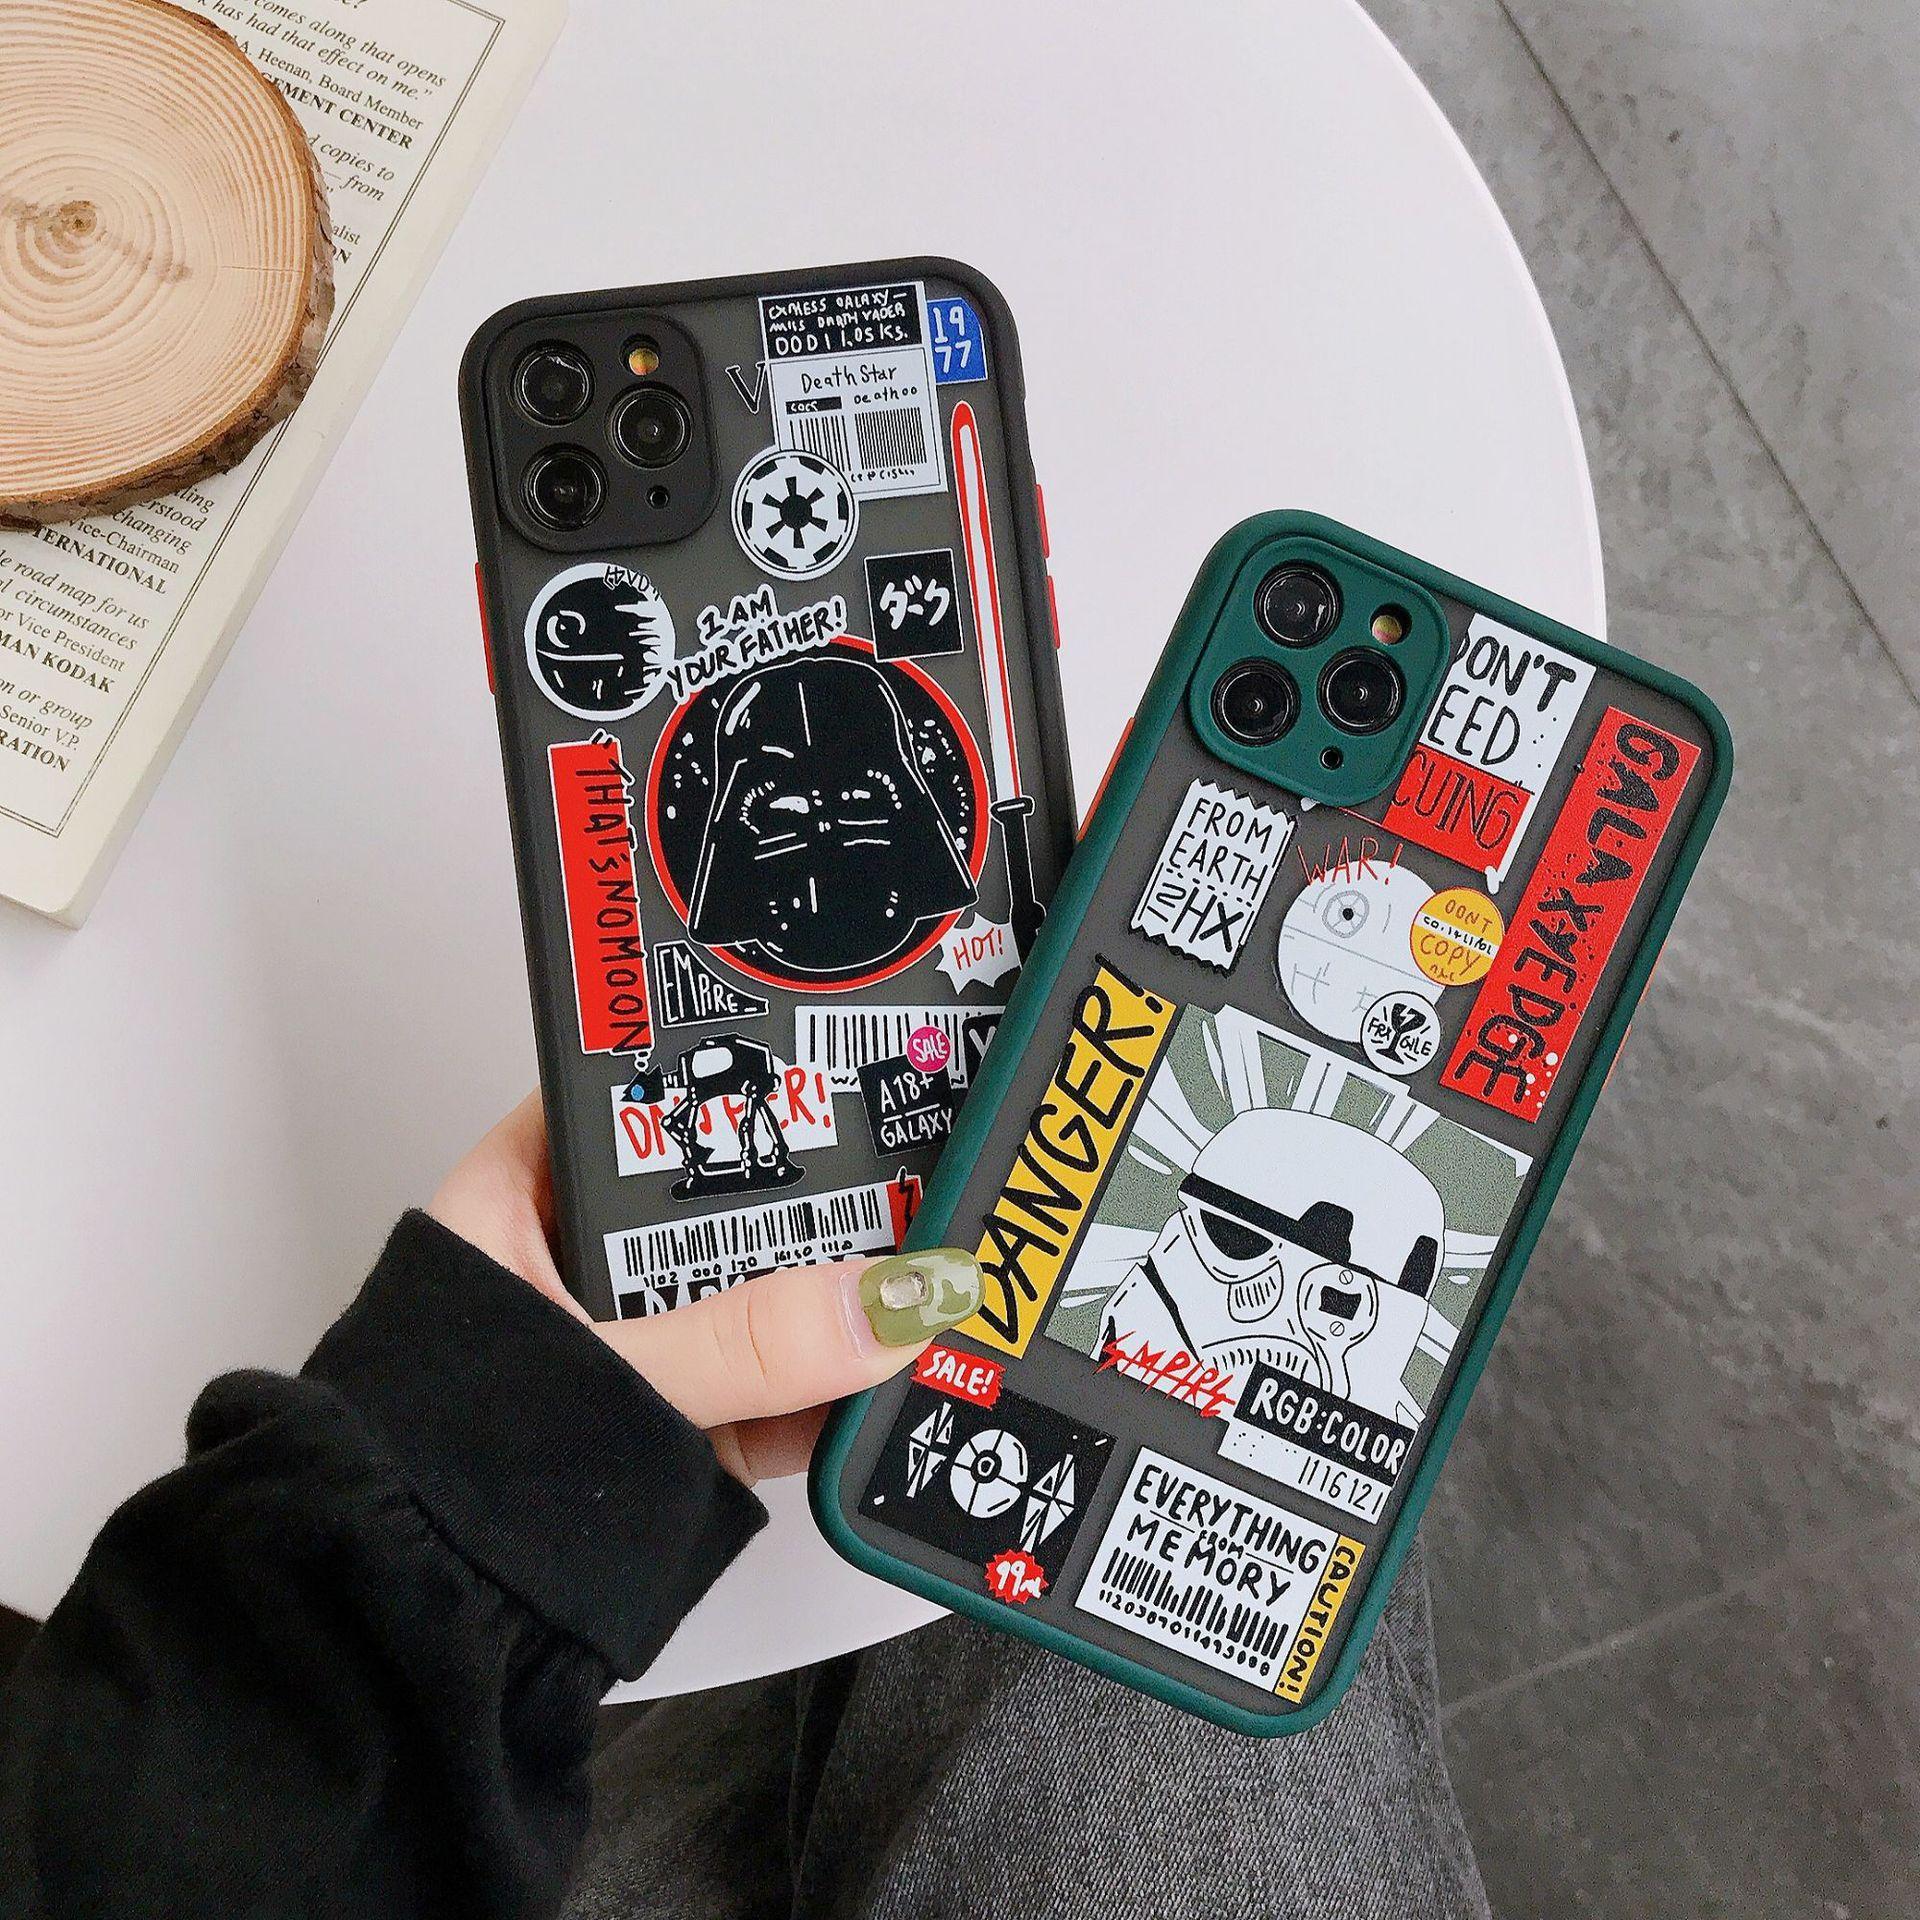 Mobile para 11 max White y creative Teléfono es XR / 11 Dibujos animados iPhone Samurai Pro Protective Skin Funda negra adecuada Avlax